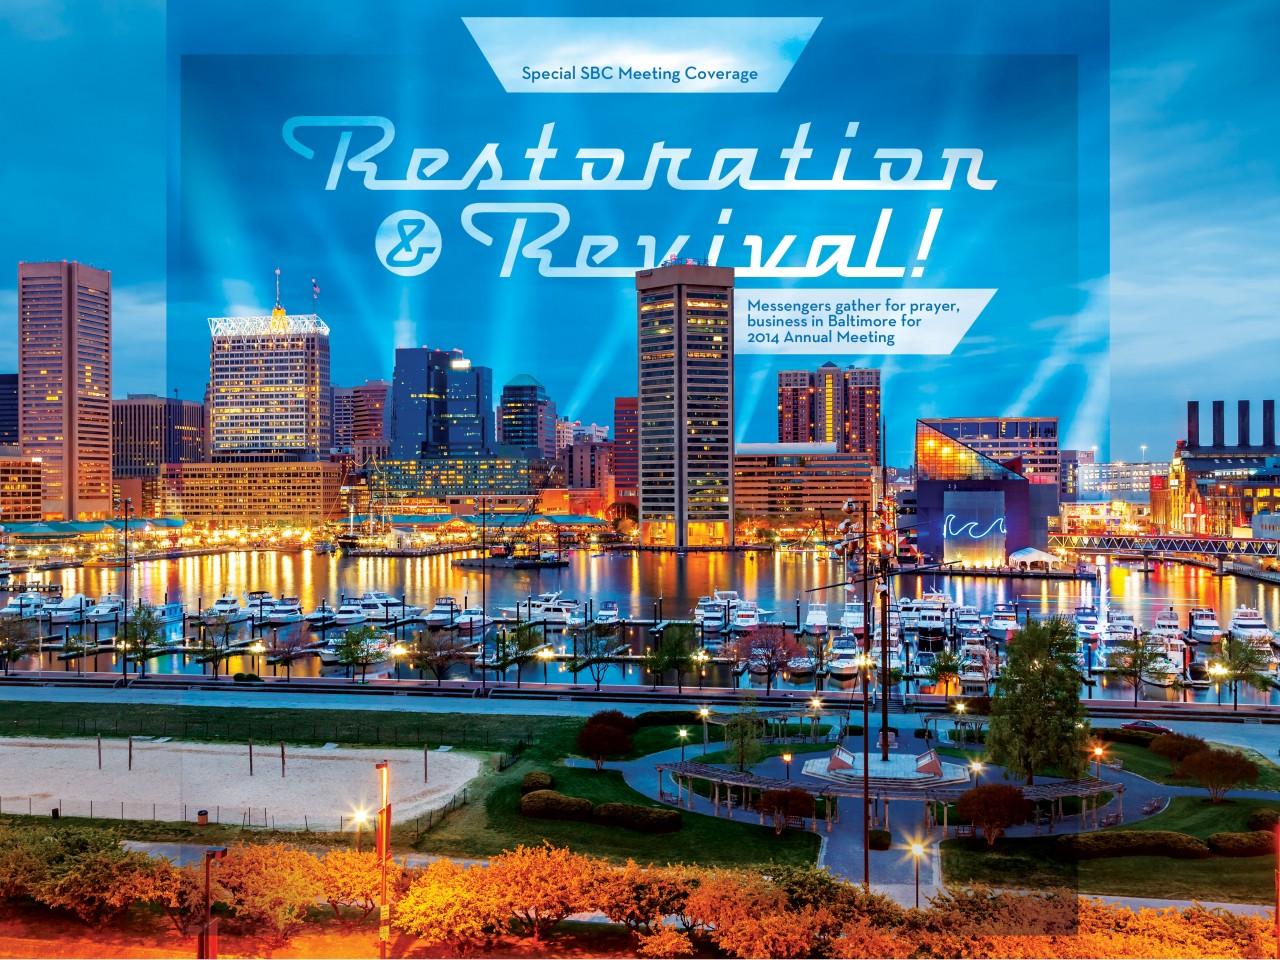 Restoration & Revival!